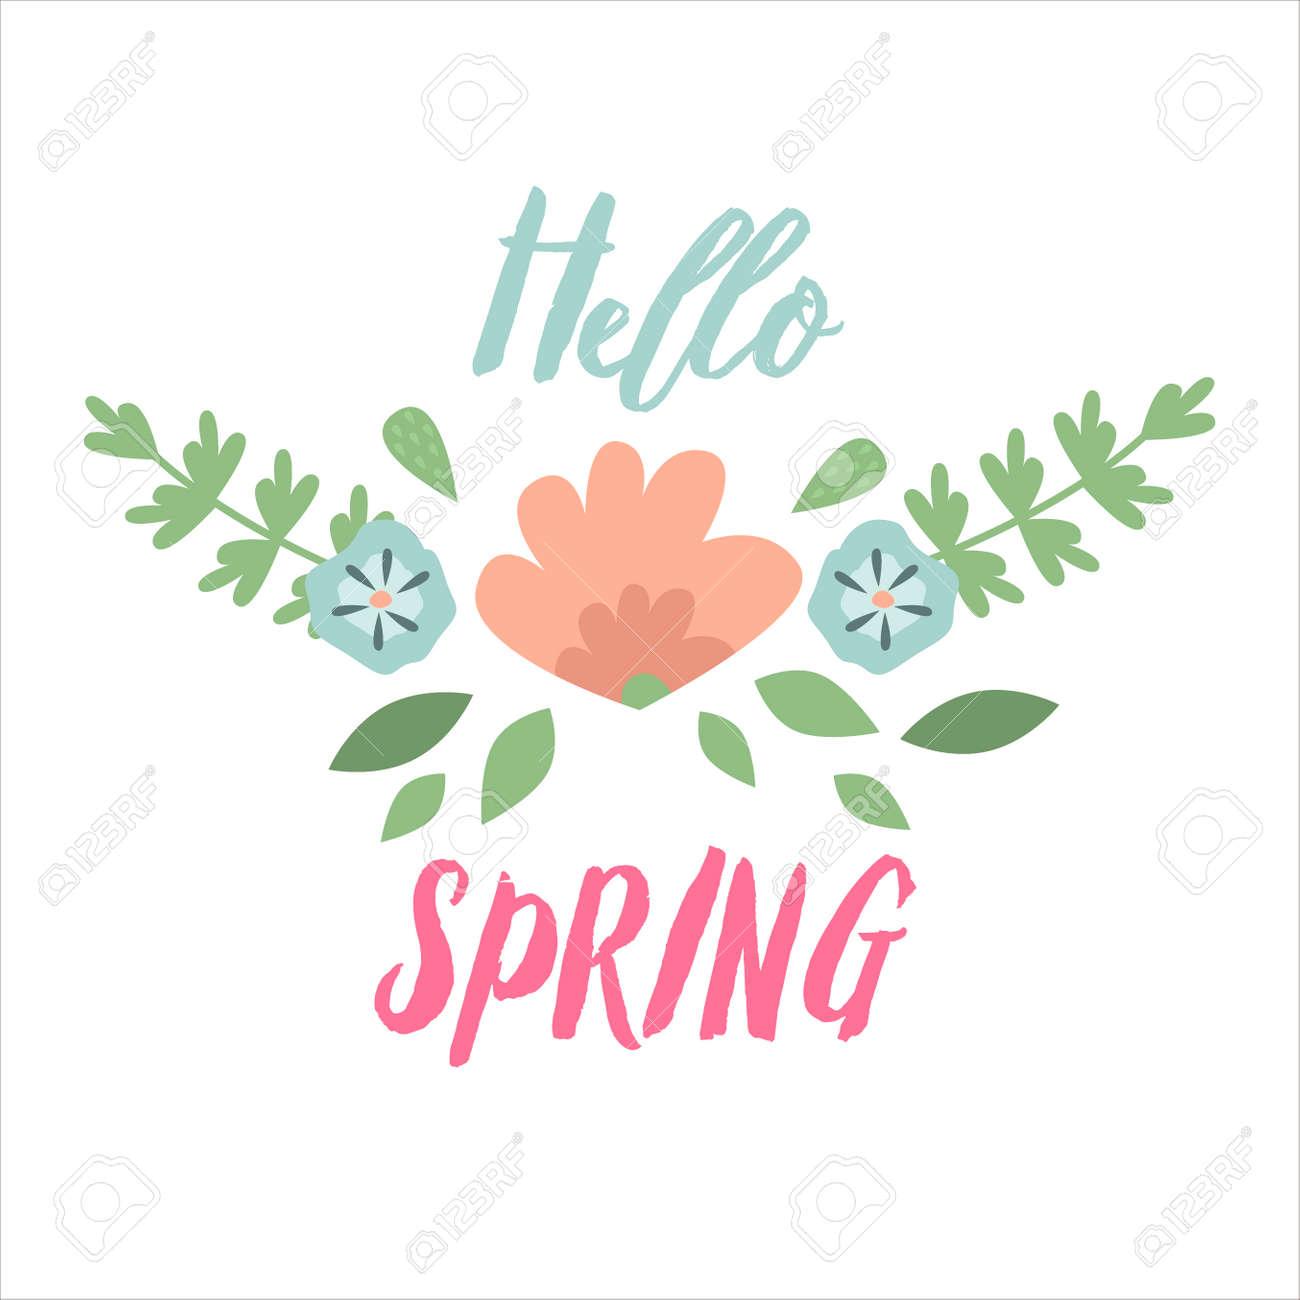 spring typographic flower design vector elements spring